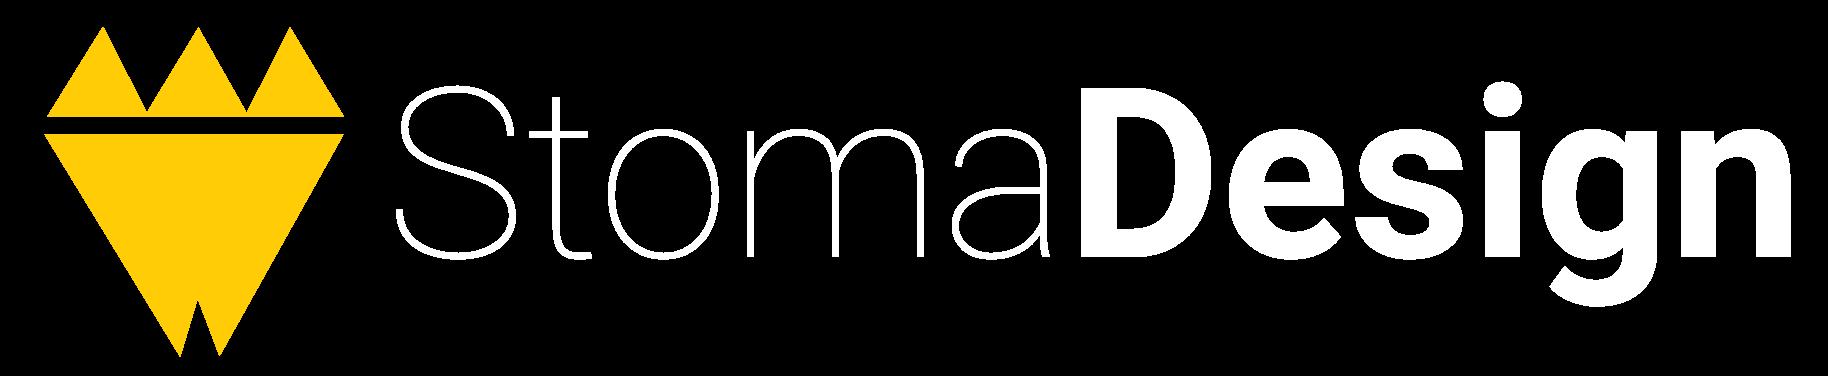 Stoma design